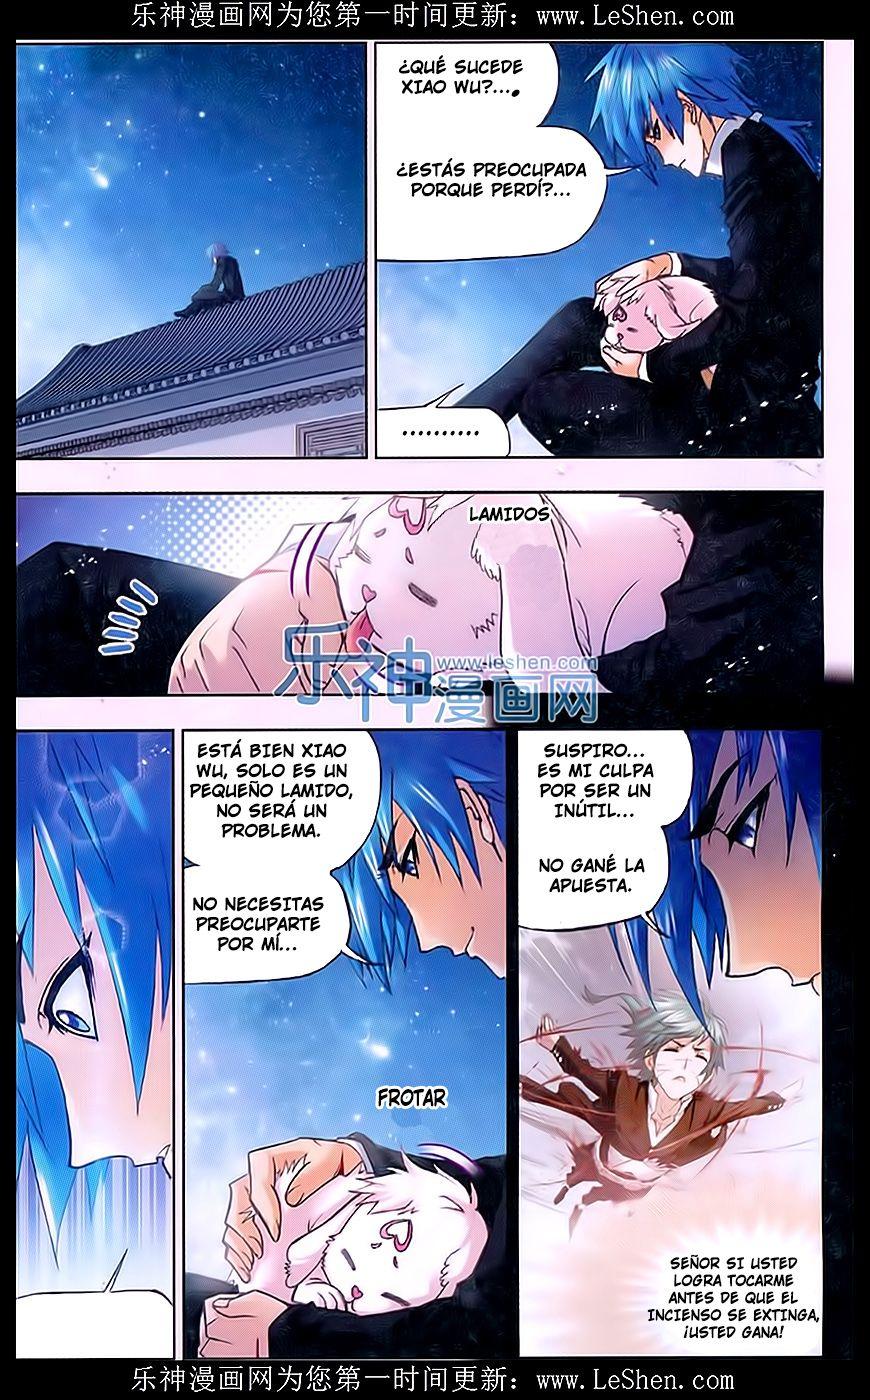 https://c5.mangatag.com/es_manga/18/16210/468272/4e02e04eec267ea7444076a6030b7b1a.jpg Page 3